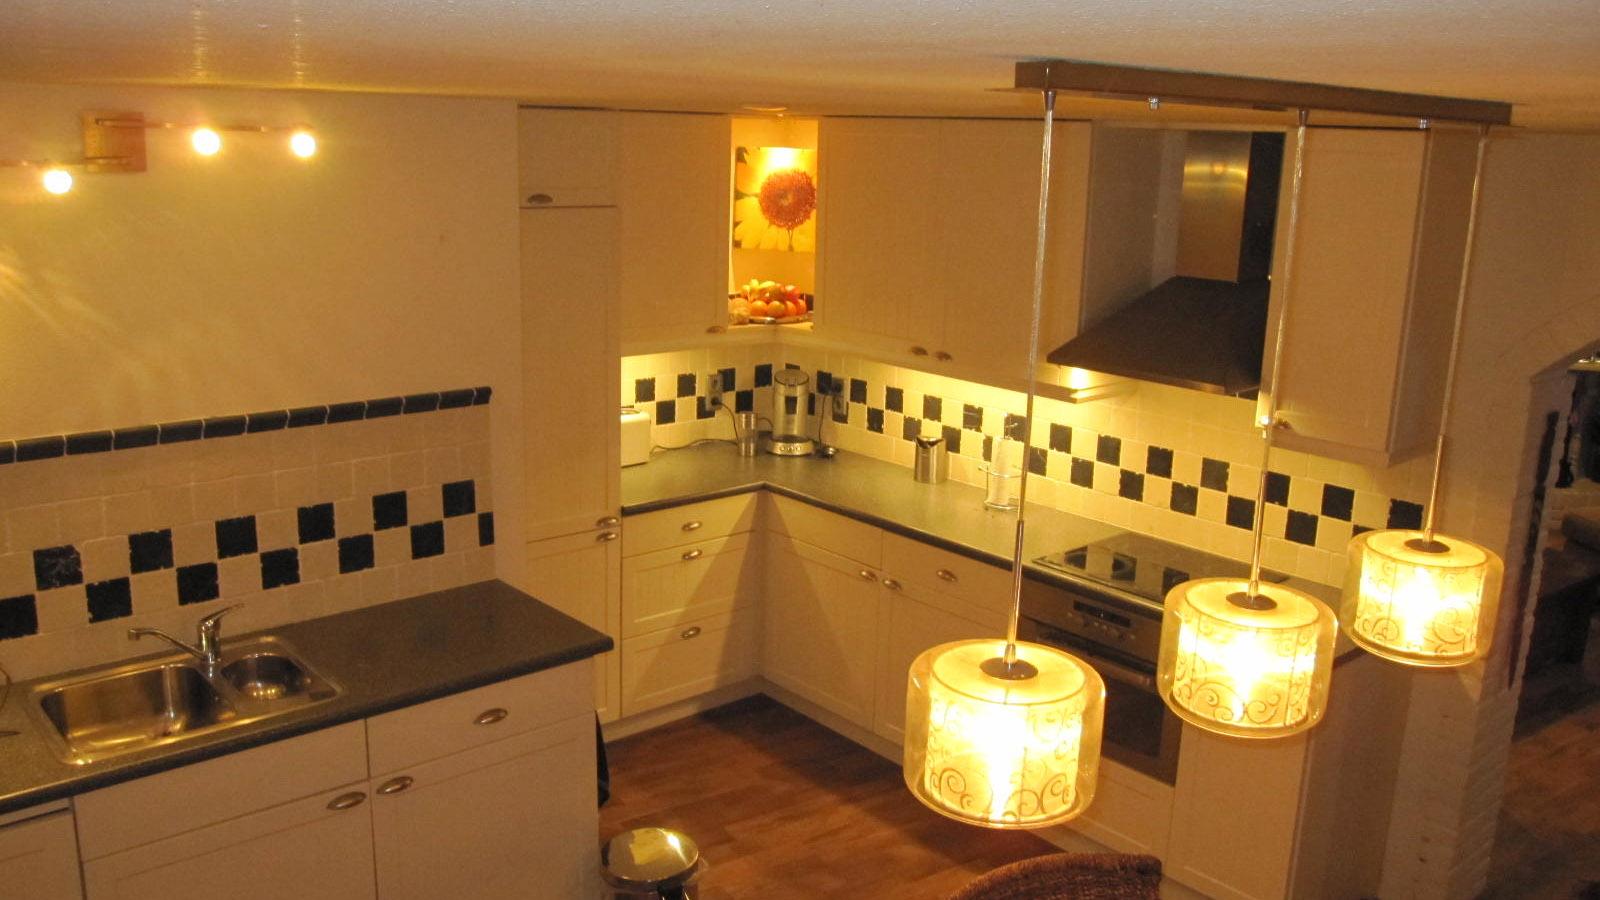 Keuken Laten Plaatsen : Keuken laten plaatsen timmerman en klusbedrijf mp timmerwerken